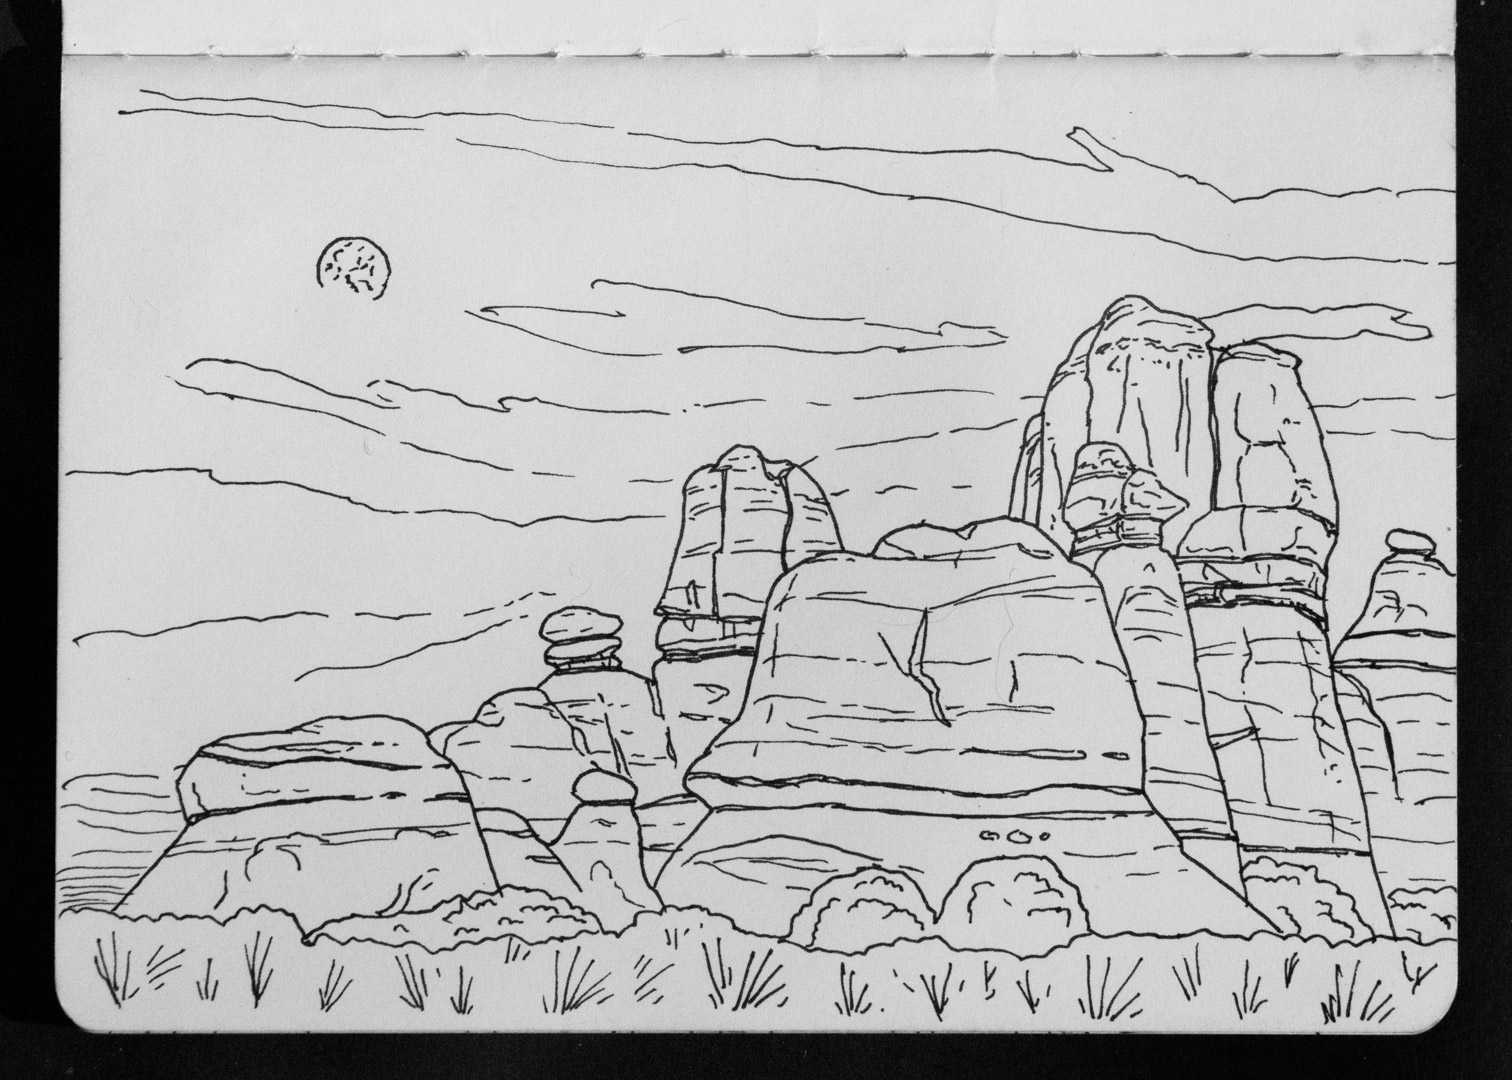 01-03 Castle near Colorado and Green Confluence.jpg